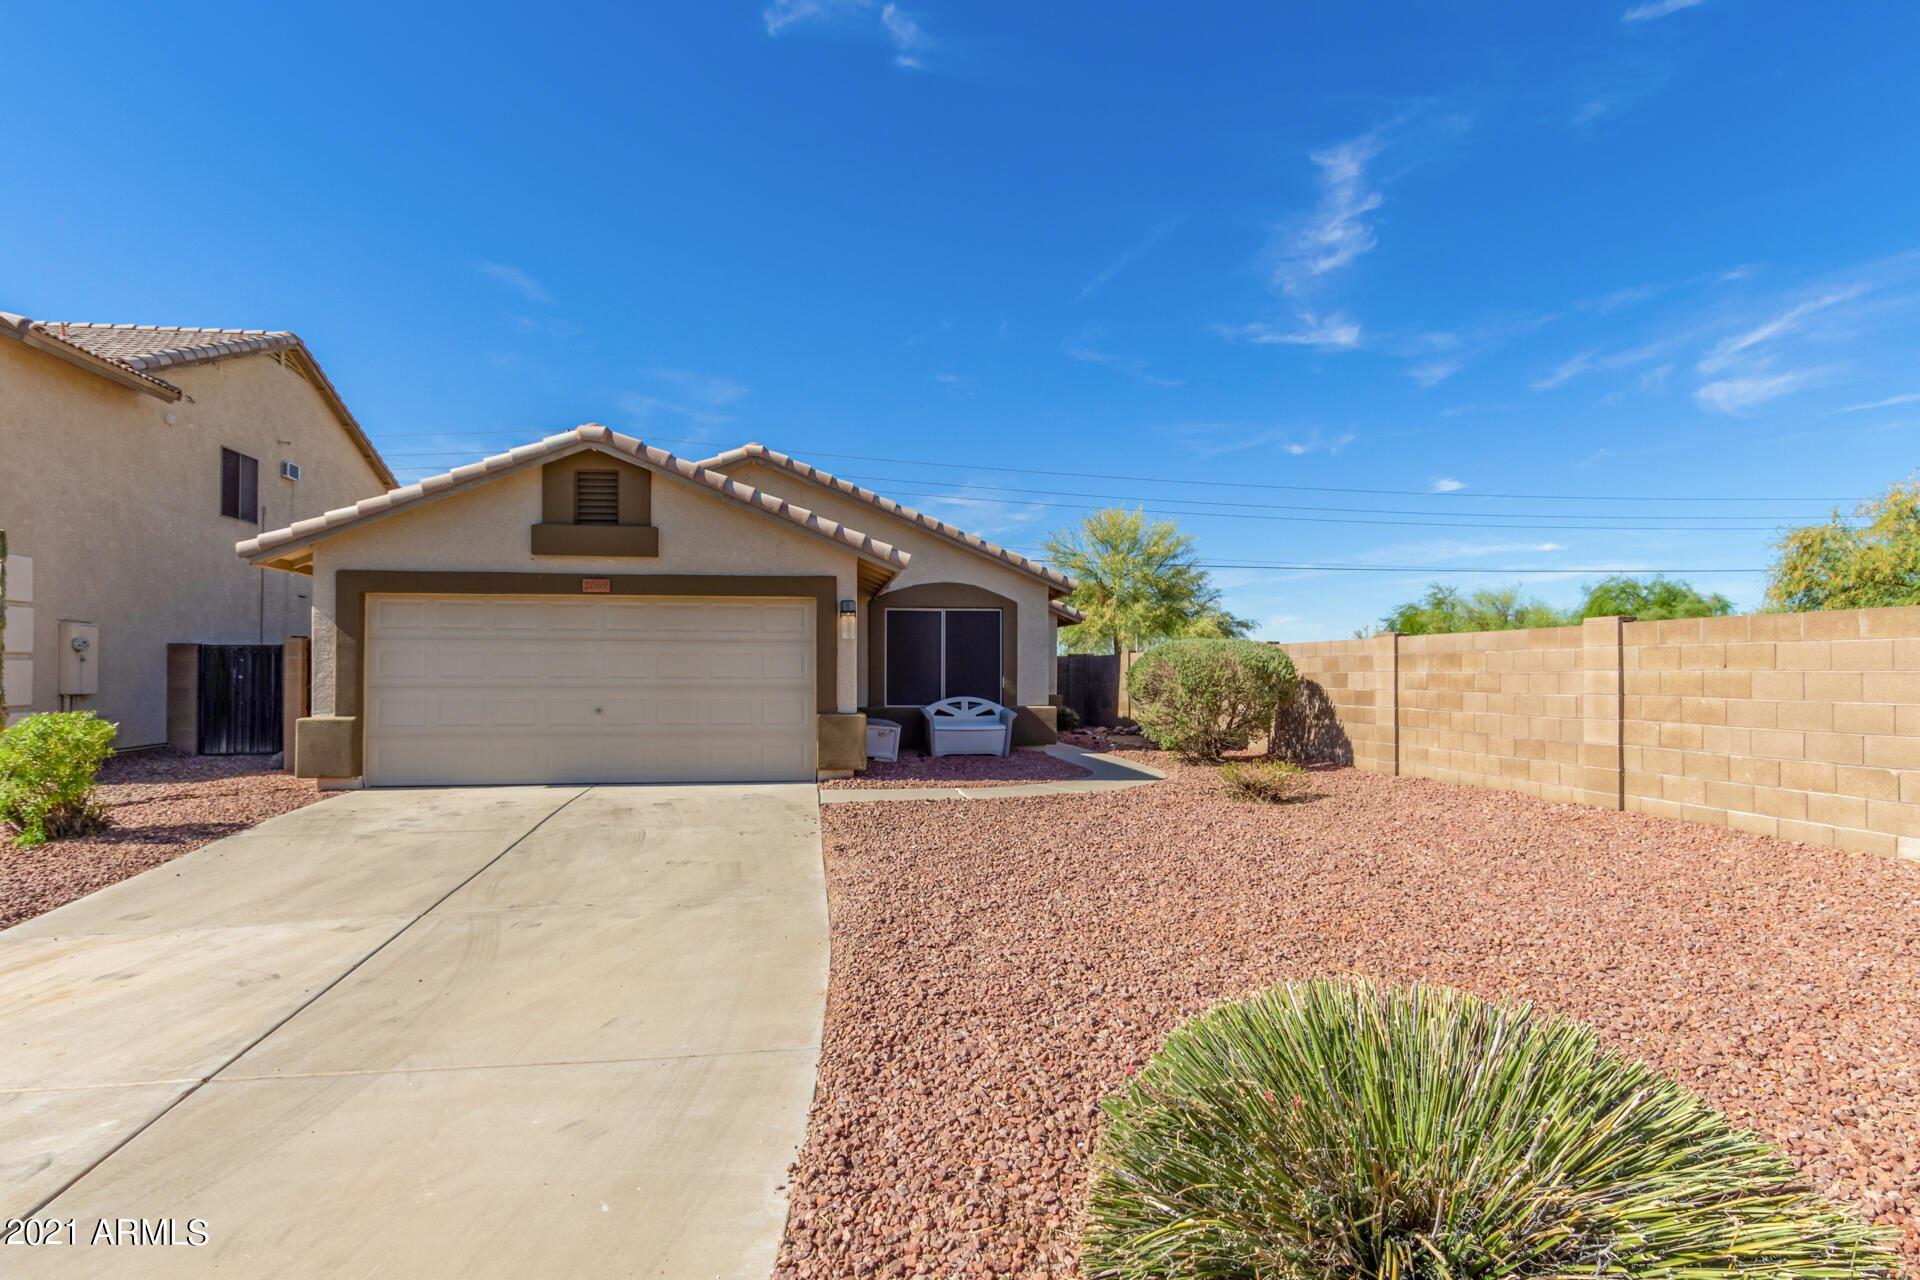 Photo of 2069 E 39TH Avenue, Apache Junction, AZ 85119 (MLS # 6249499)